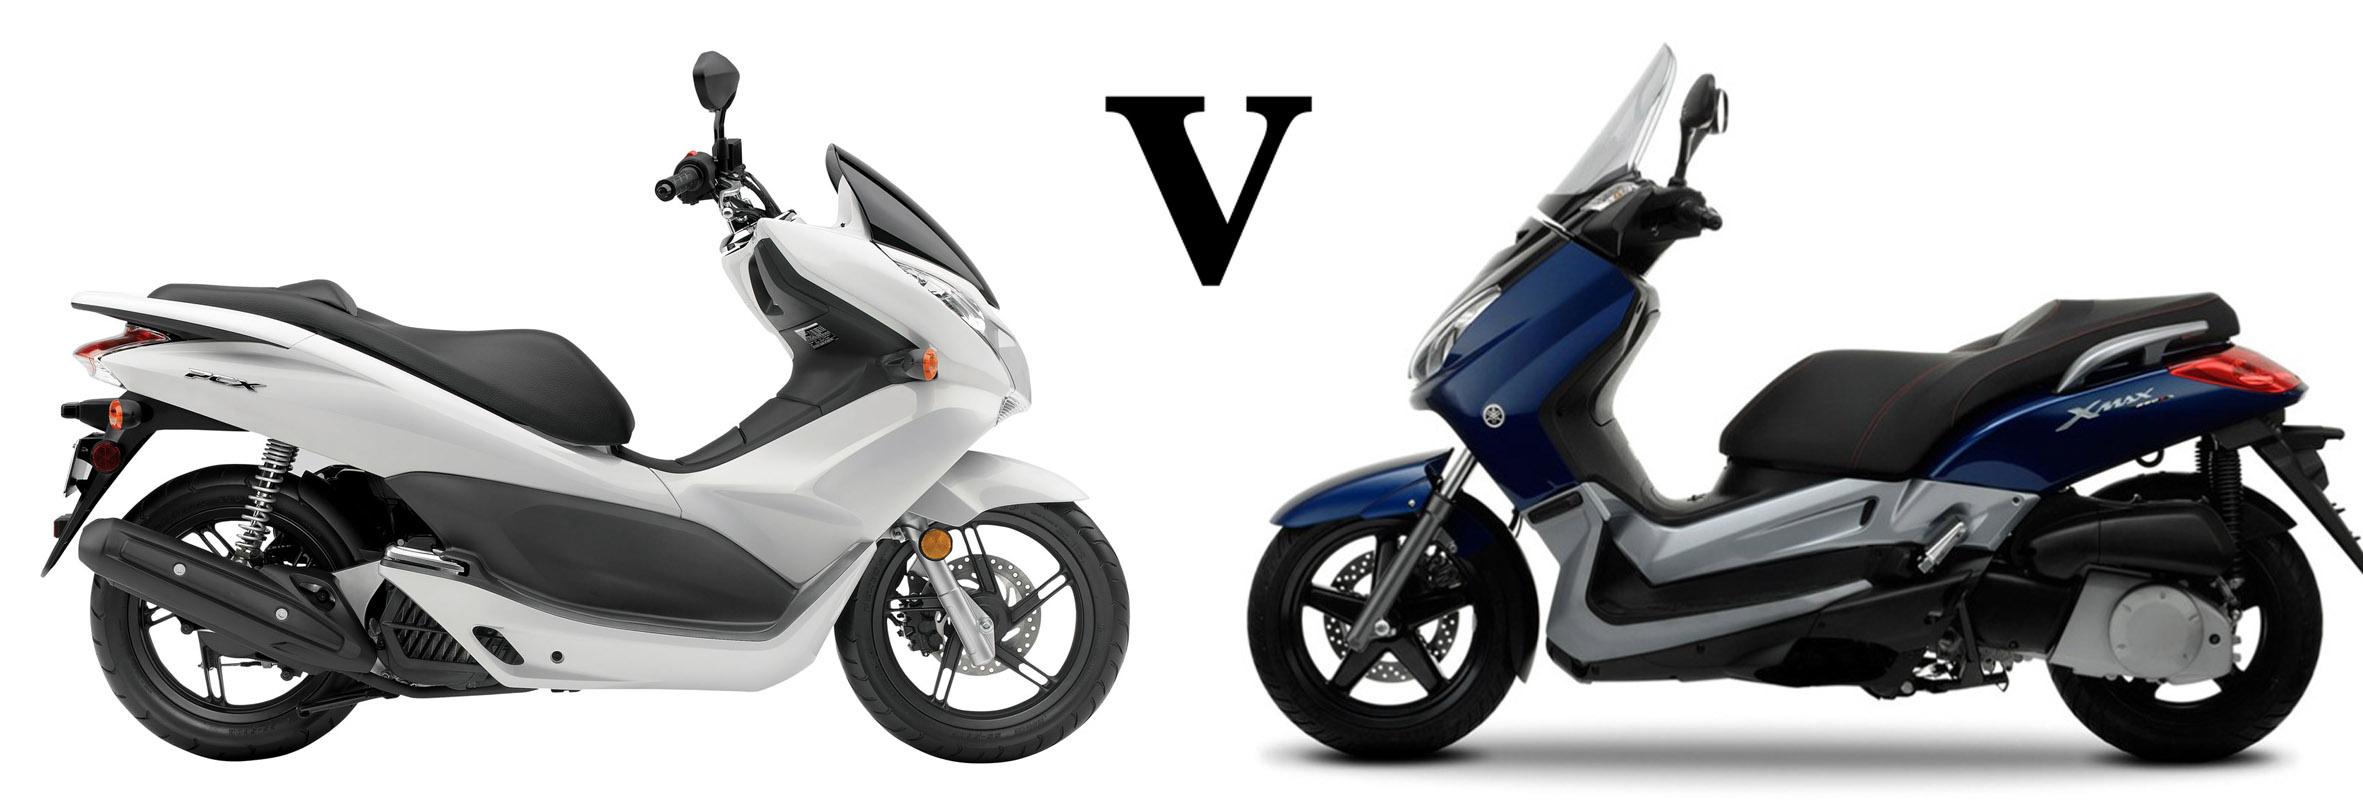 Versus: Honda PCX125 vs Yamaha X-Max 125